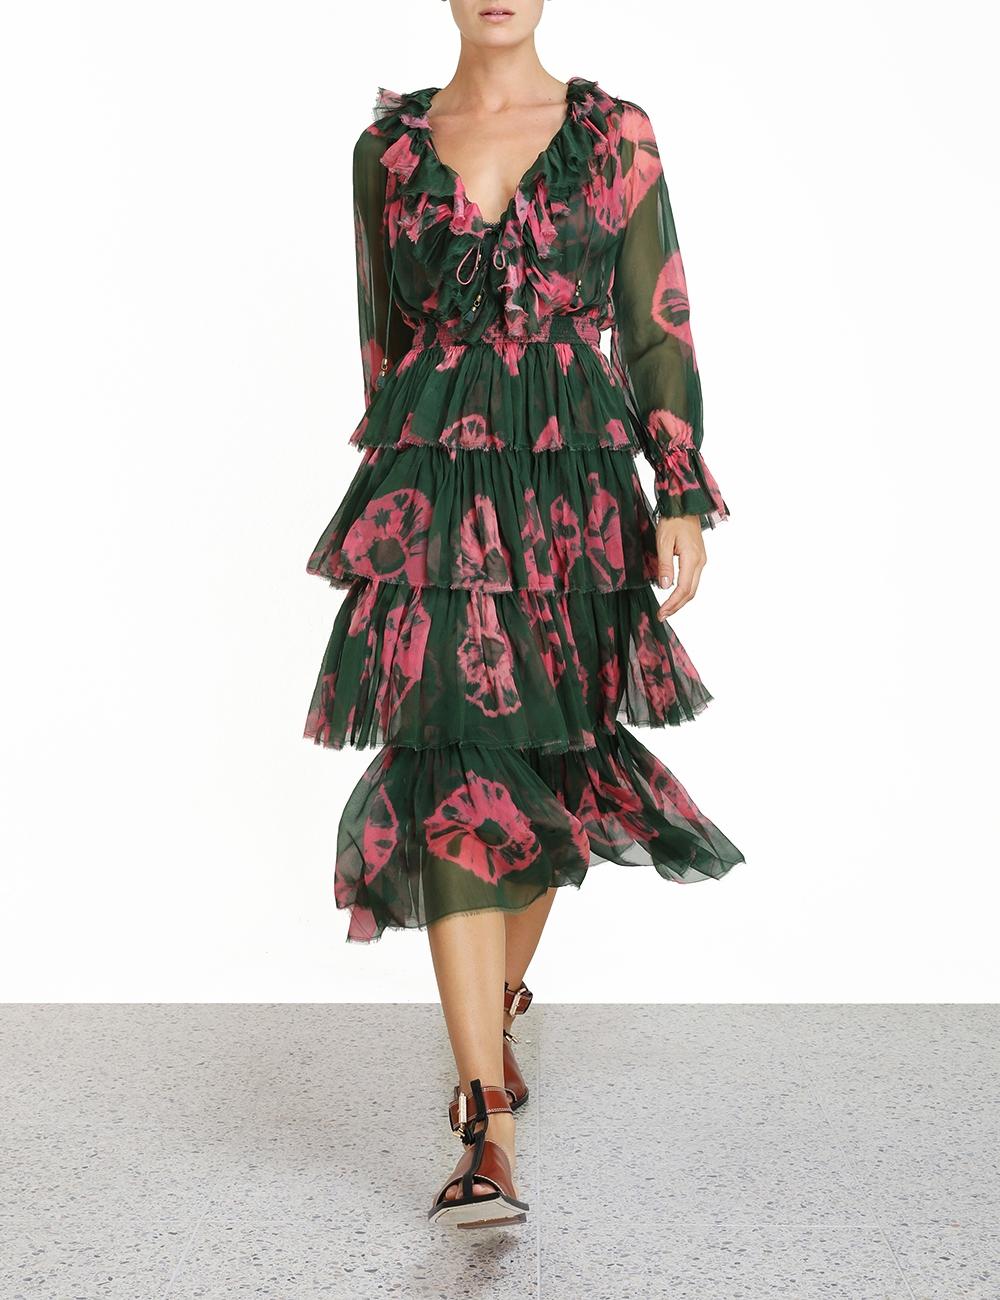 Poppy Tiered Frill Dress